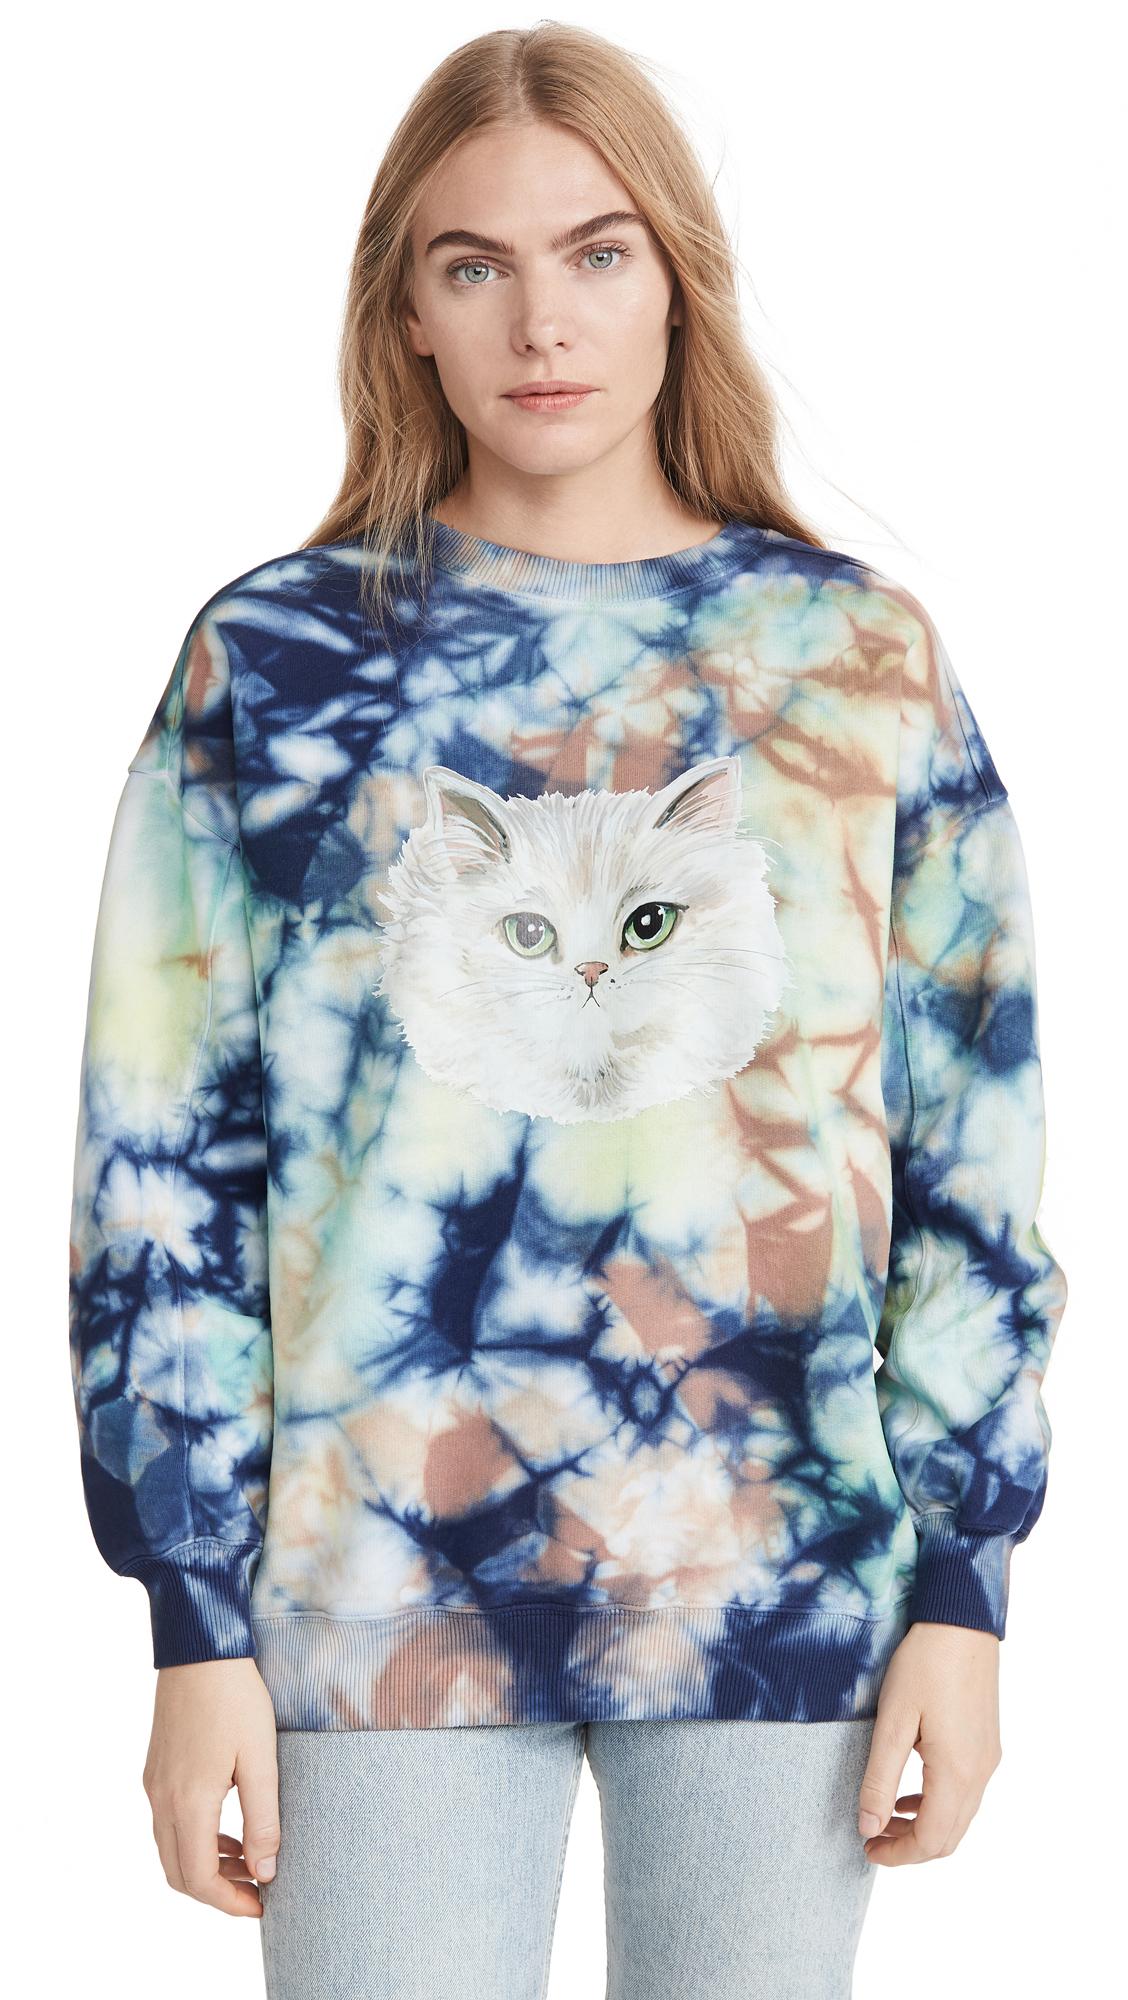 Photo of Paul & Joe Sister Jordy Sweatshirt - shop Paul & Joe Sister Clothing, Shirts, Tops online